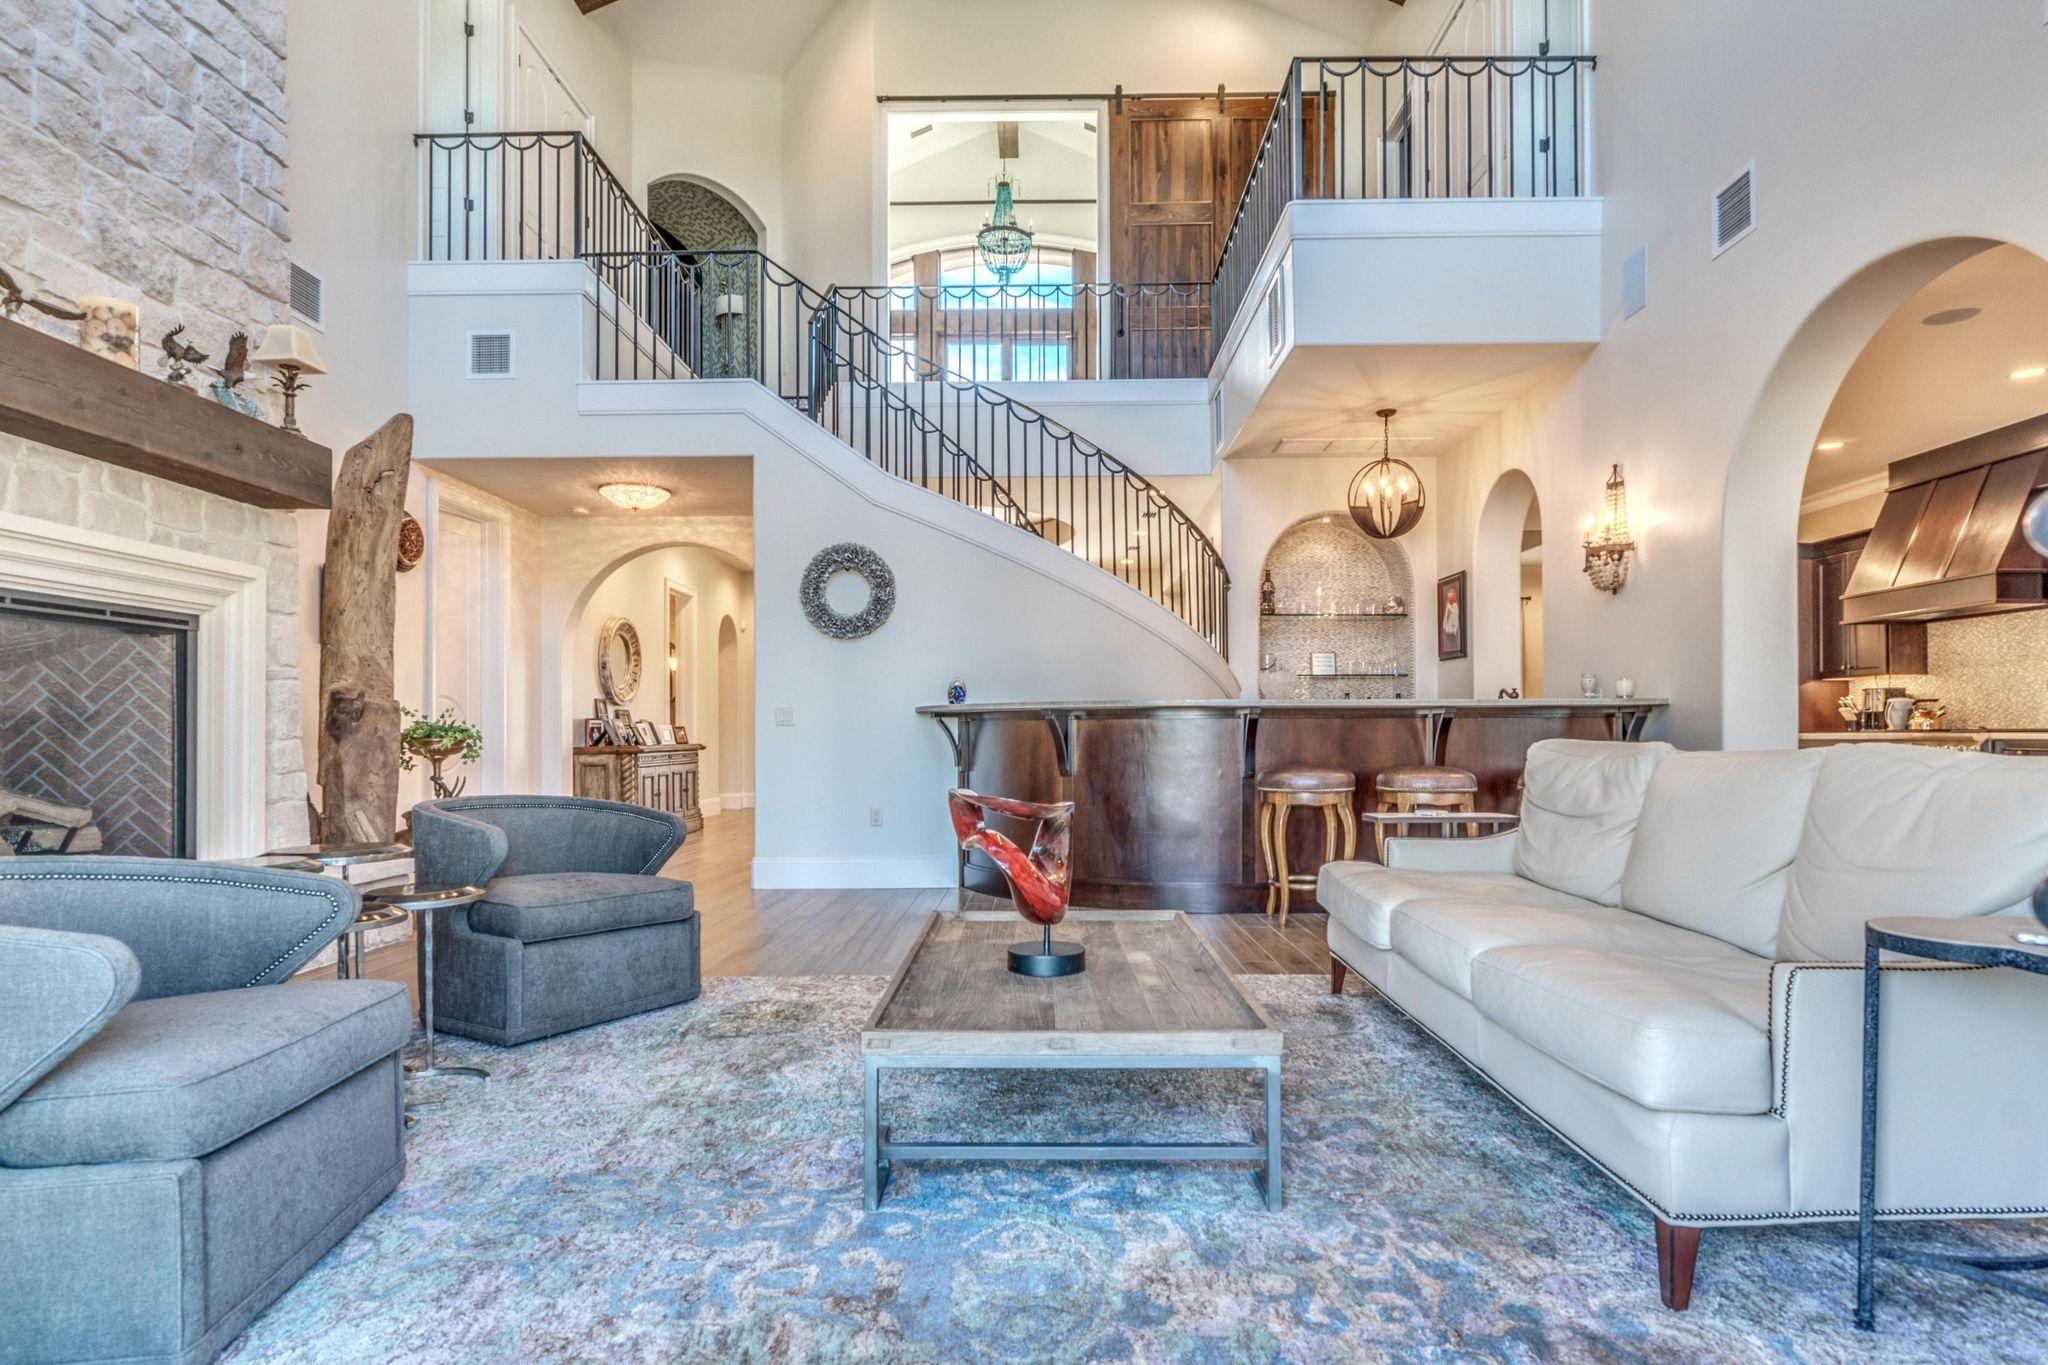 4858 W County Highway 30A #A, Santa Rosa Beach, FL 32459   4 Bed, 5 Bath  Single Family Home   MLS #816654   71 Photos | Trulia